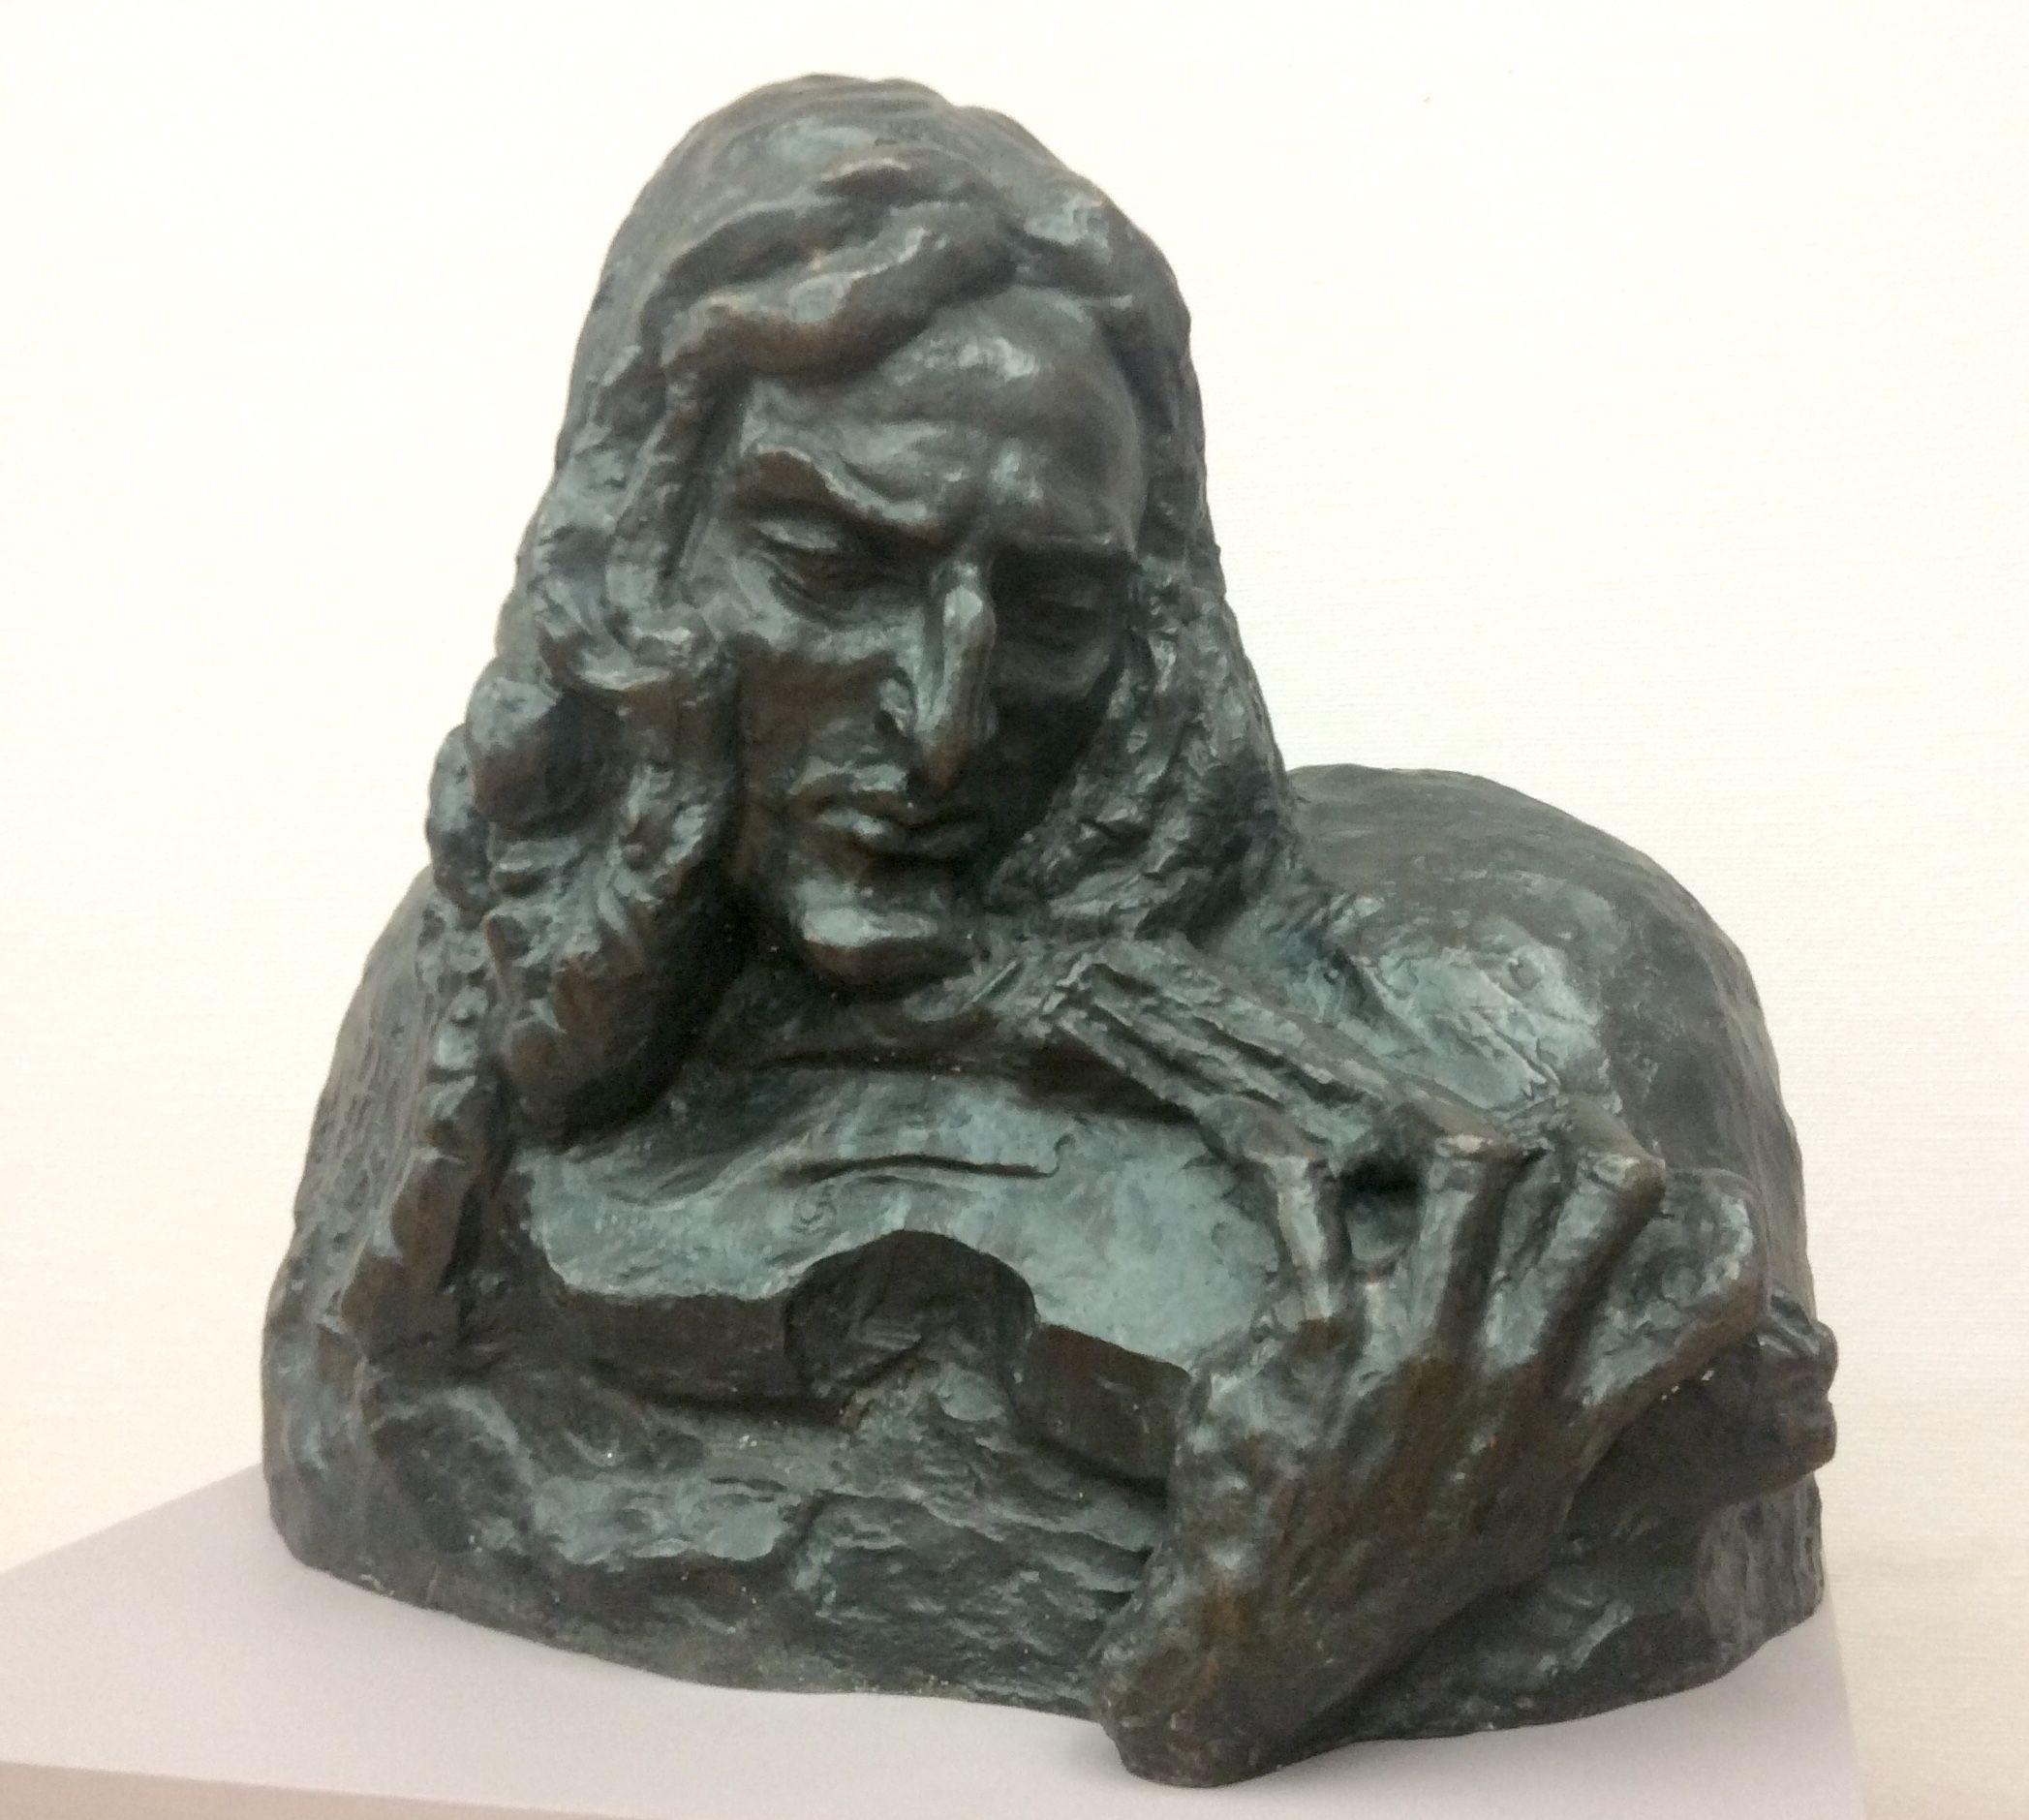 пейзажи скульптуры коненкова картинки контагиозный моллюск